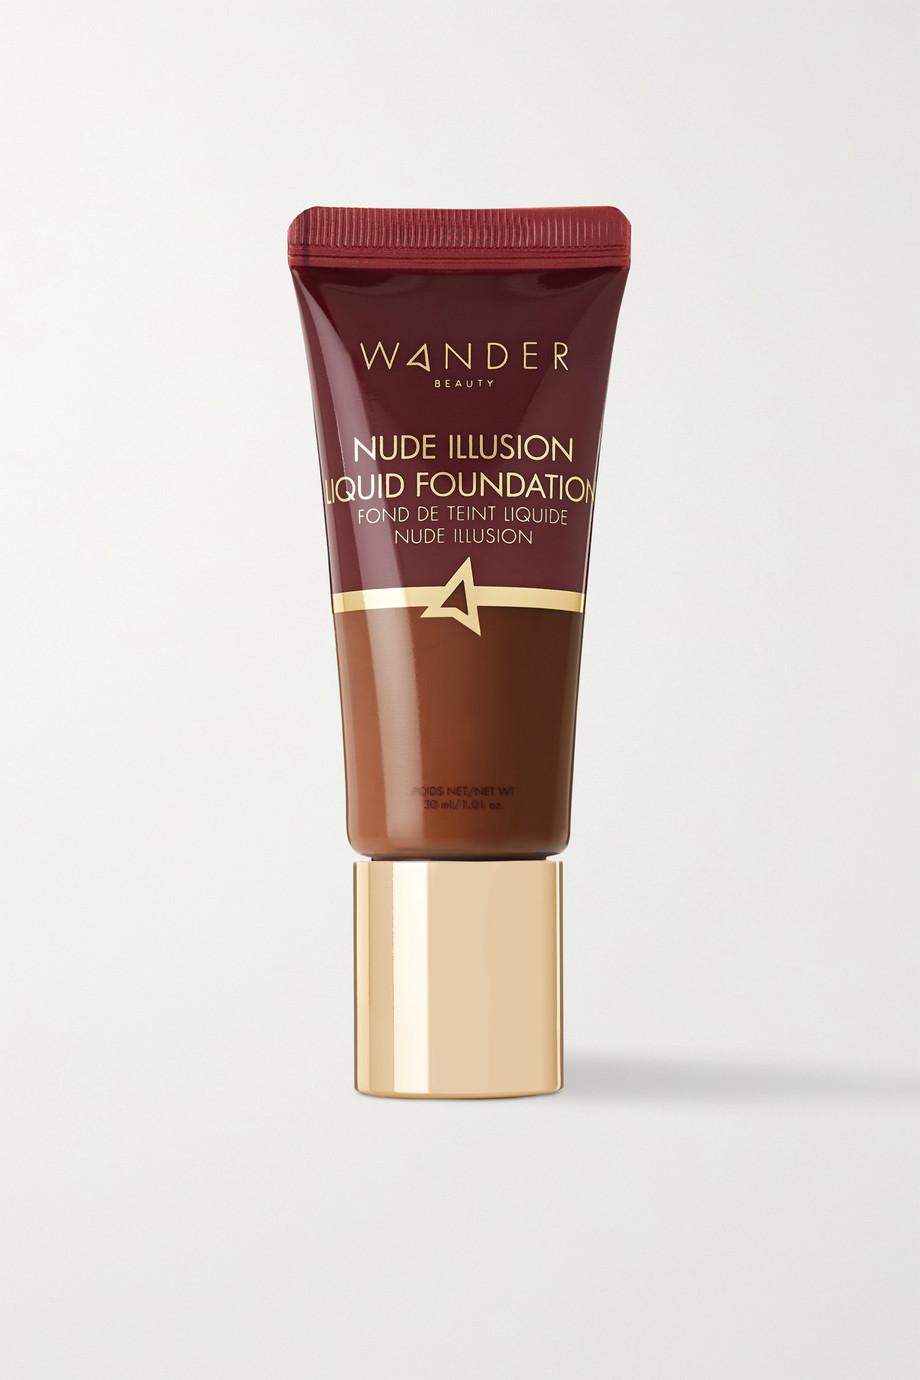 Wander Beauty Nude Illusion Liquid Foundation – Rich Deep – Foundation